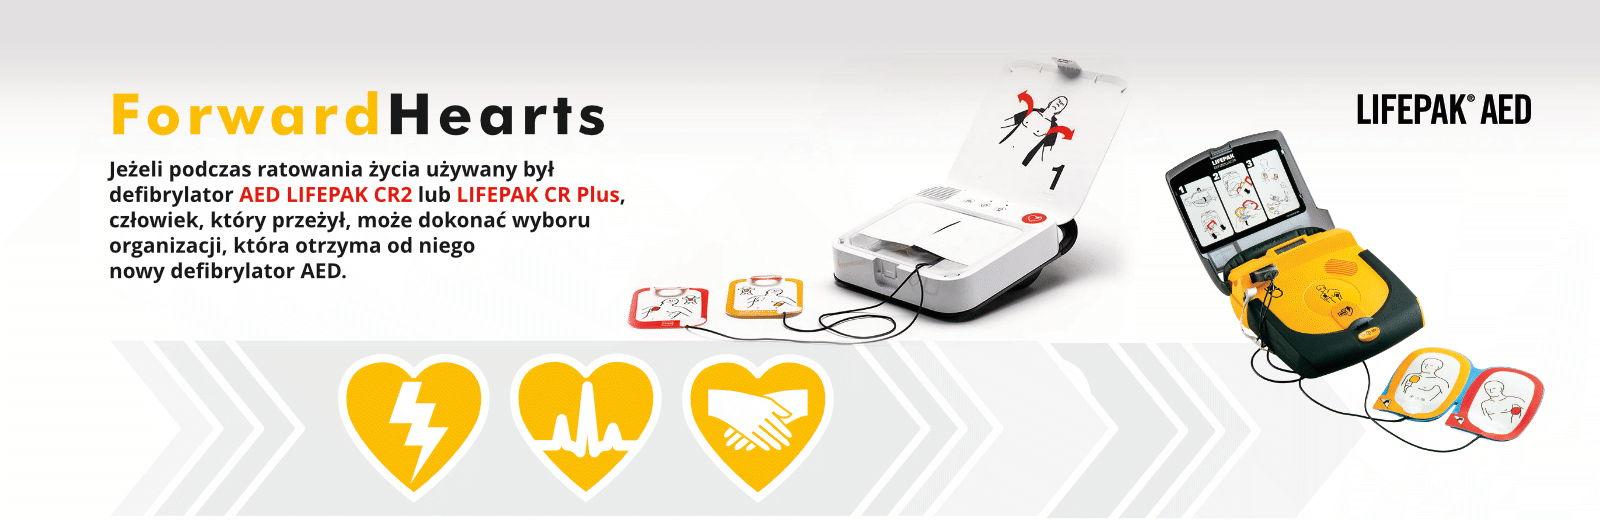 Forward Heart AED Lifepak